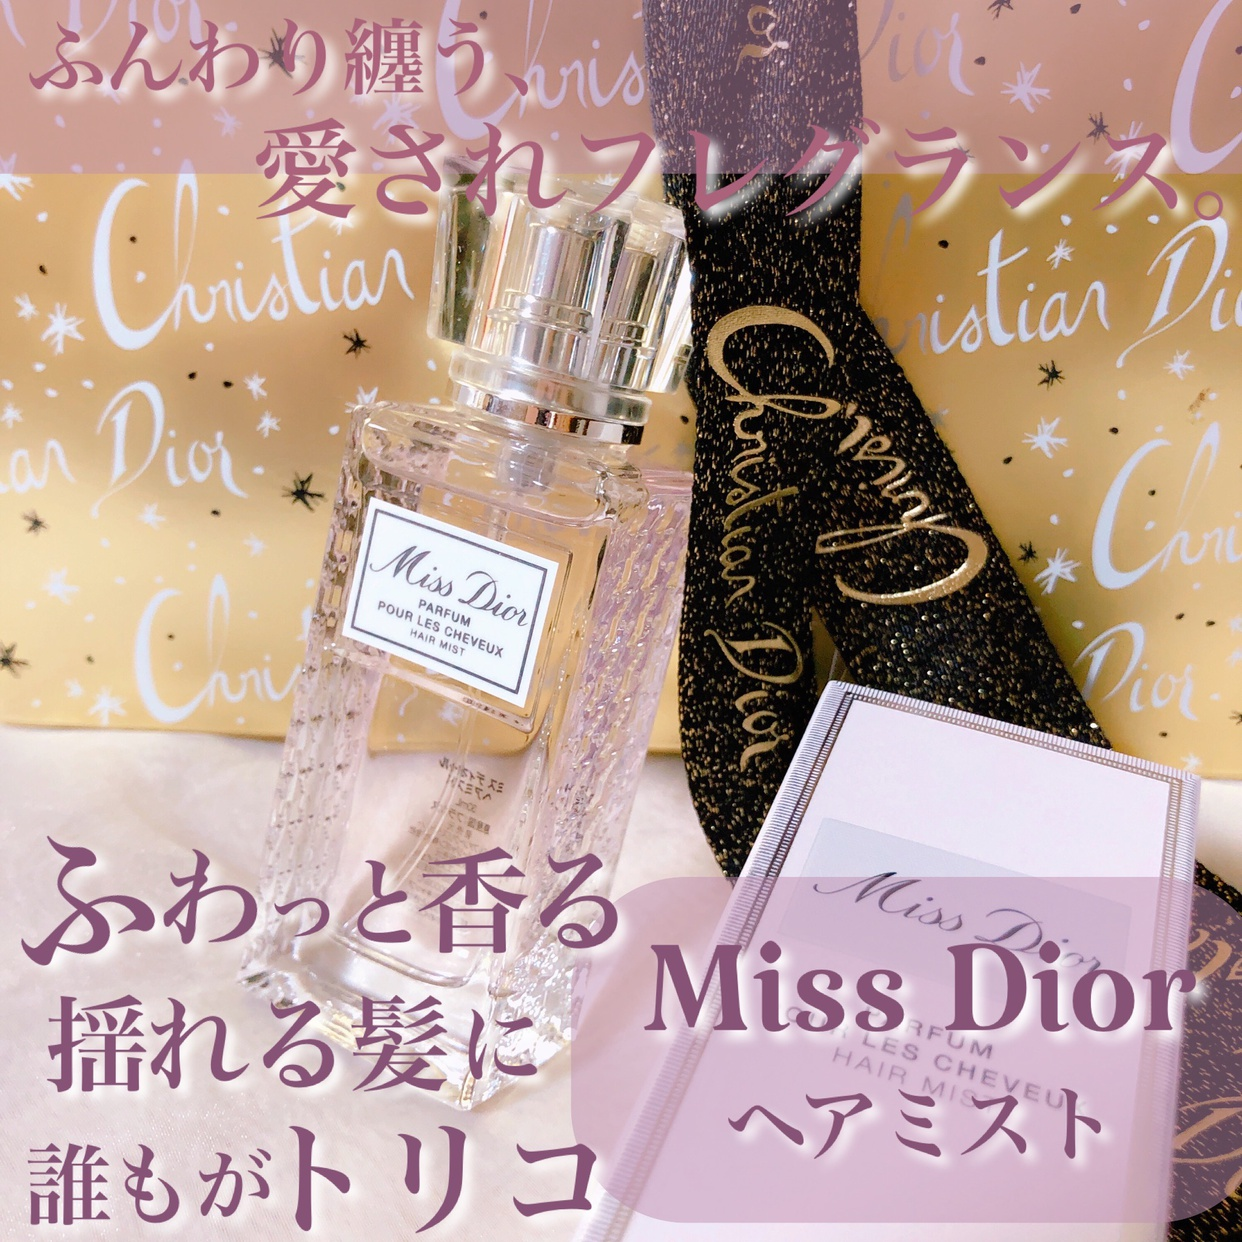 Dior(ディオール)ミス ディオール ヘアミストを使ったsatomiさんのクチコミ画像1